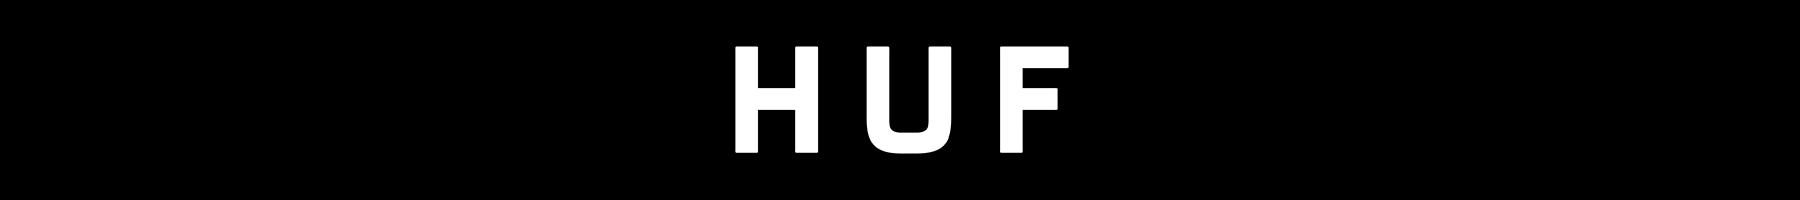 DrJays.com - HUF